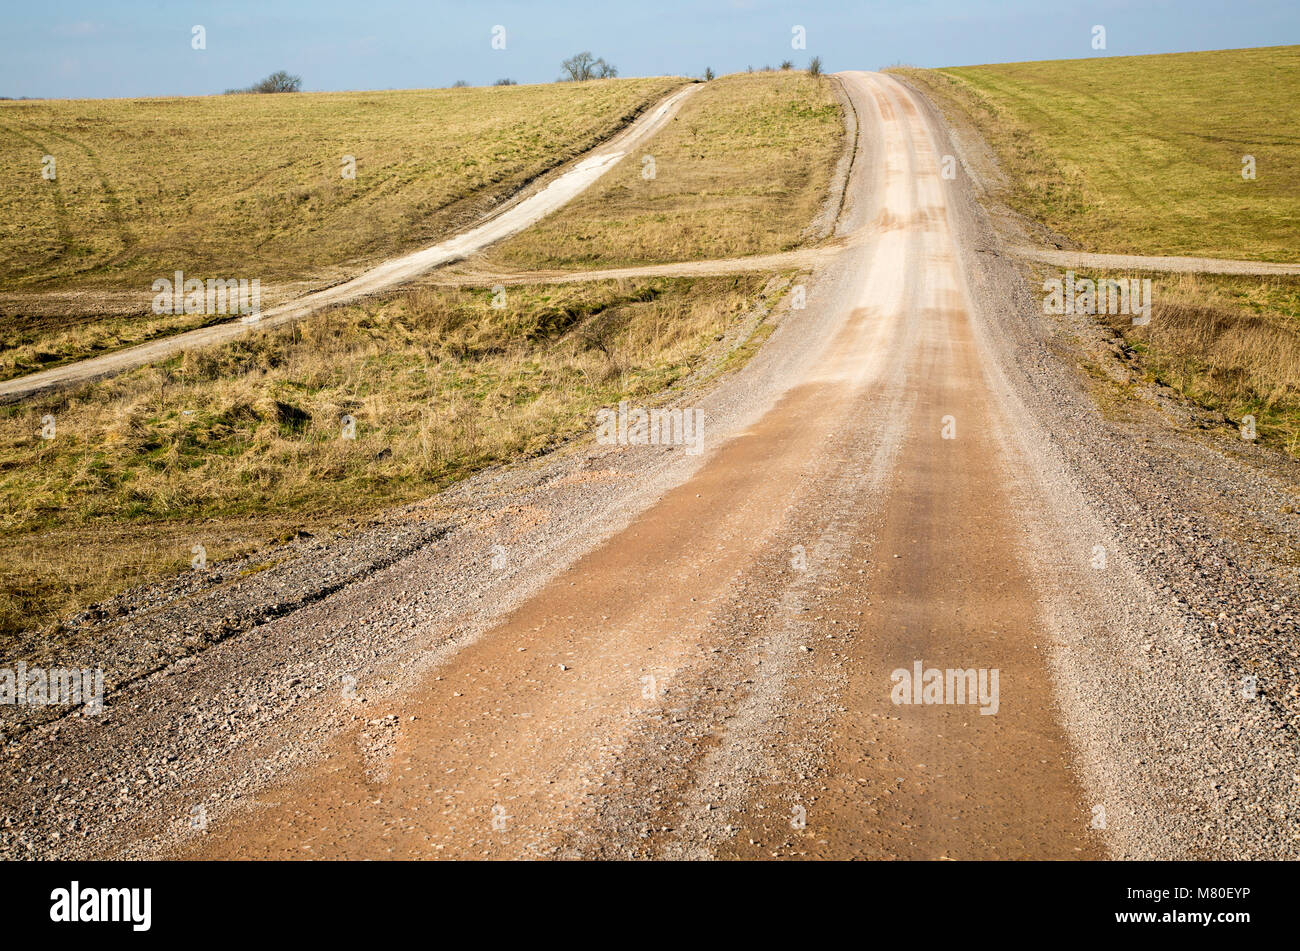 Unsurfaced road track crossing chalk landscape scenery near Chitterne, Salisbury Plain, Wiltshire, England, UK - Stock Image